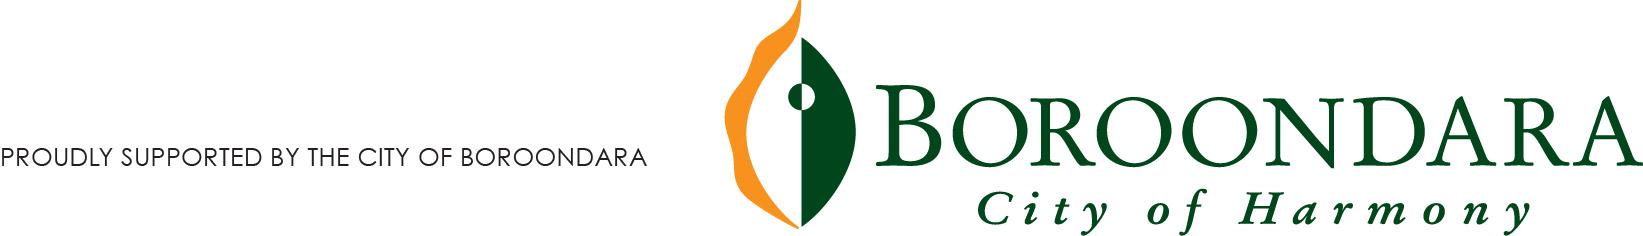 council support logo.jpg